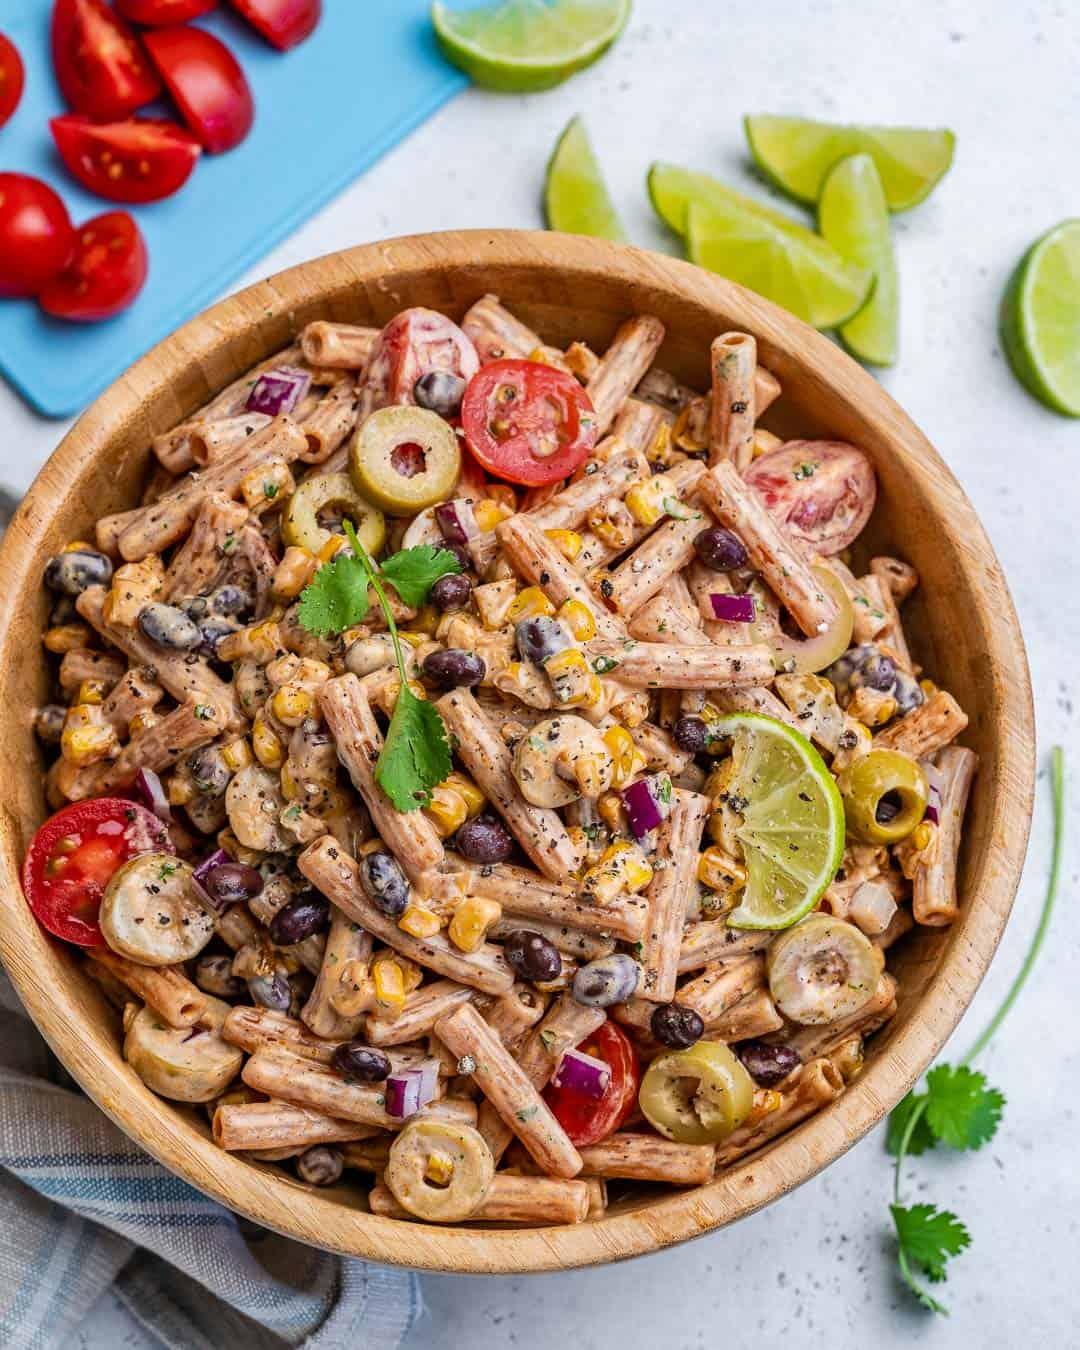 vegetarian pasta salad recipe in a bowl